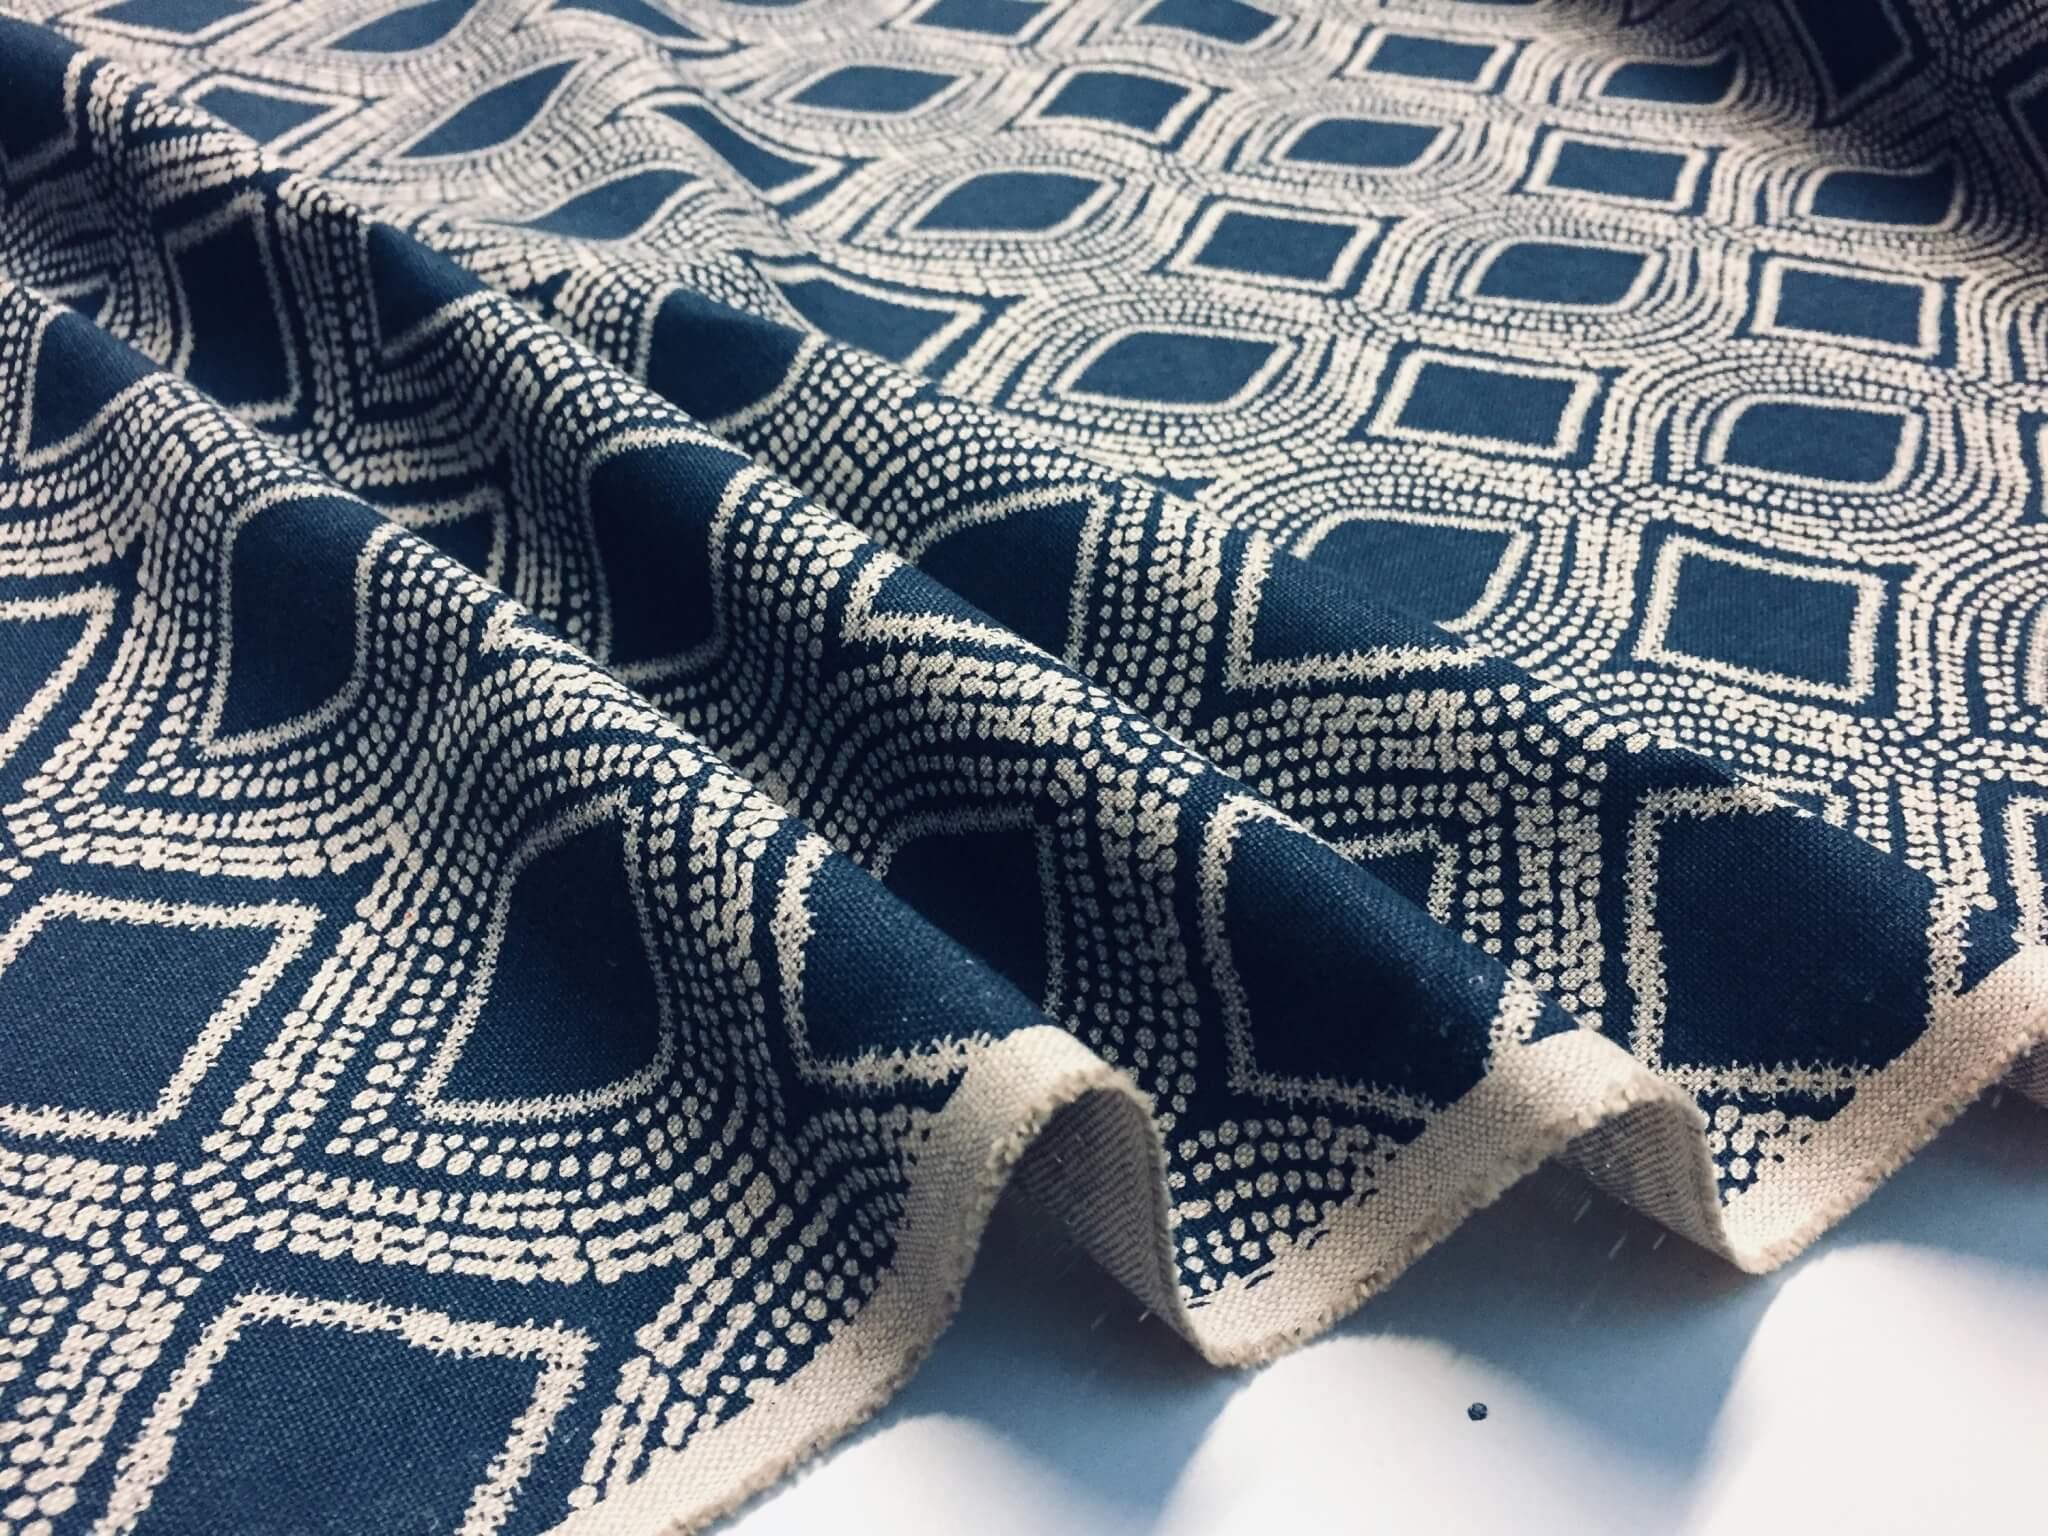 art deco damask rhombus diamond fabric linen look material furnishing curtains upholstery 140cm wide navy blue cream